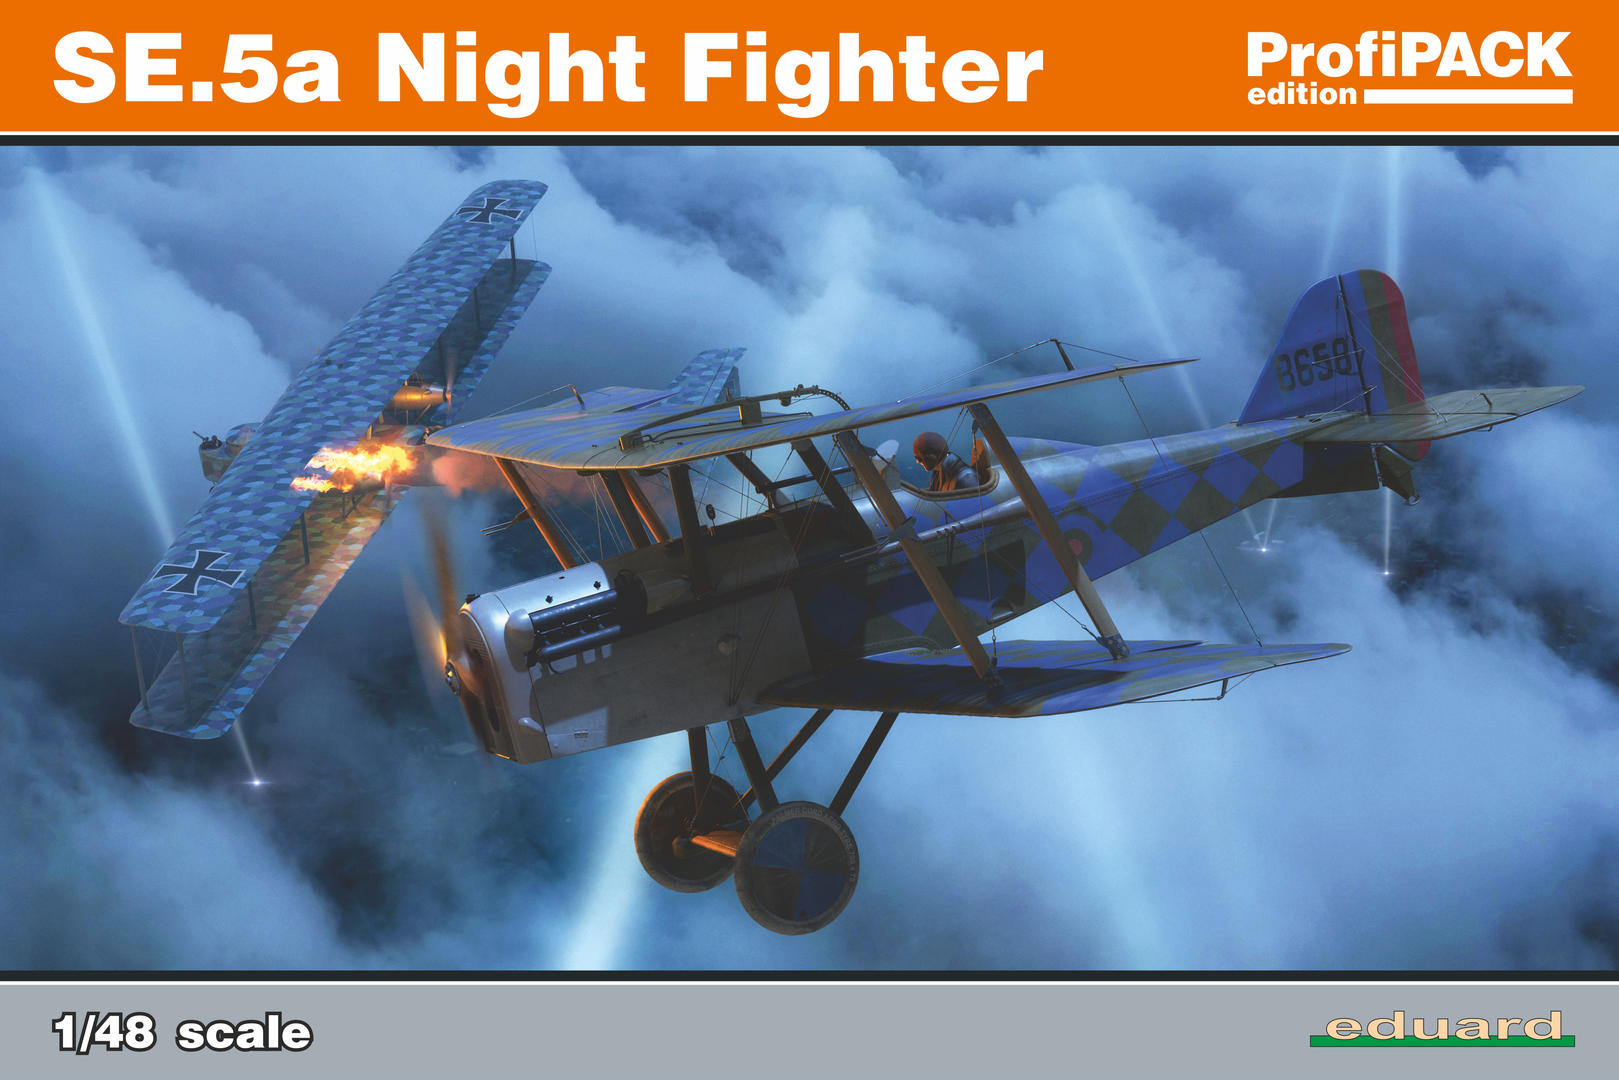 Eduard 1/48 SE.5a Night Fighter [Profipack]